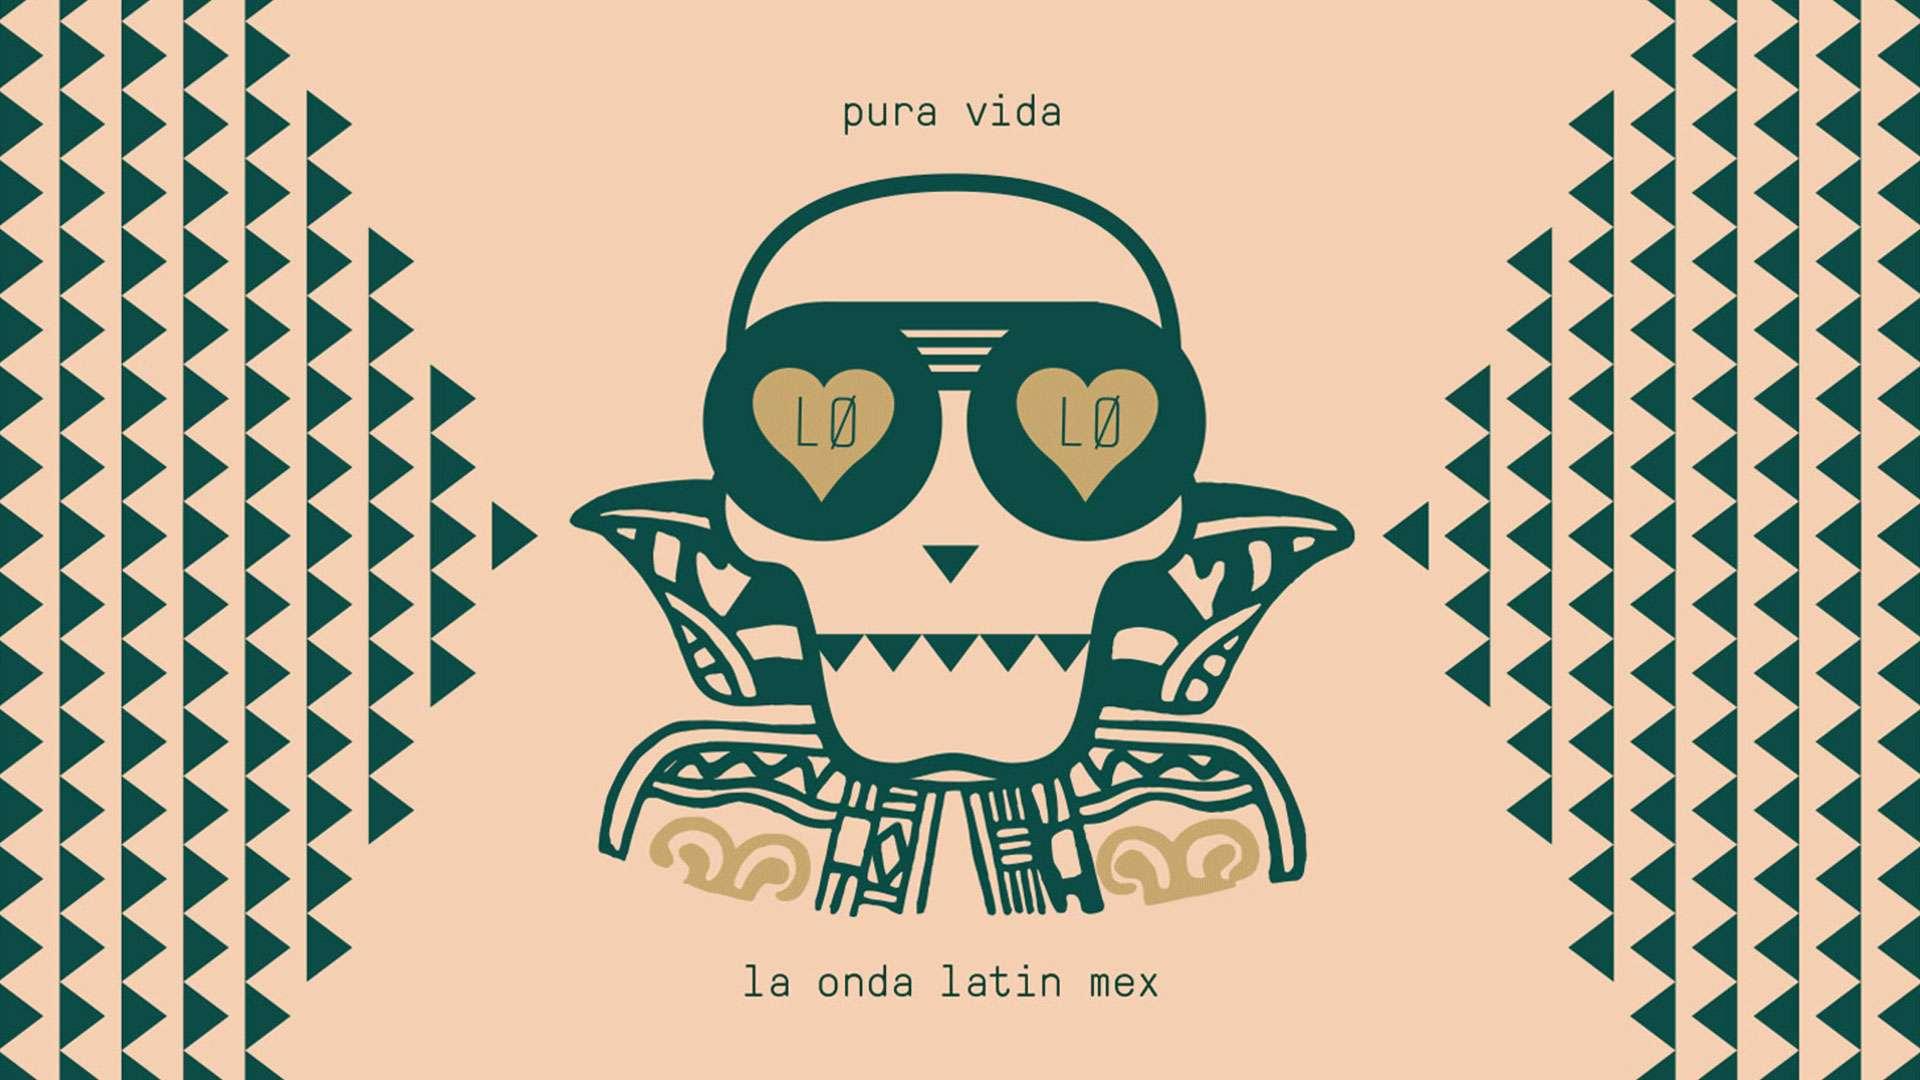 La Onda Latin Mex